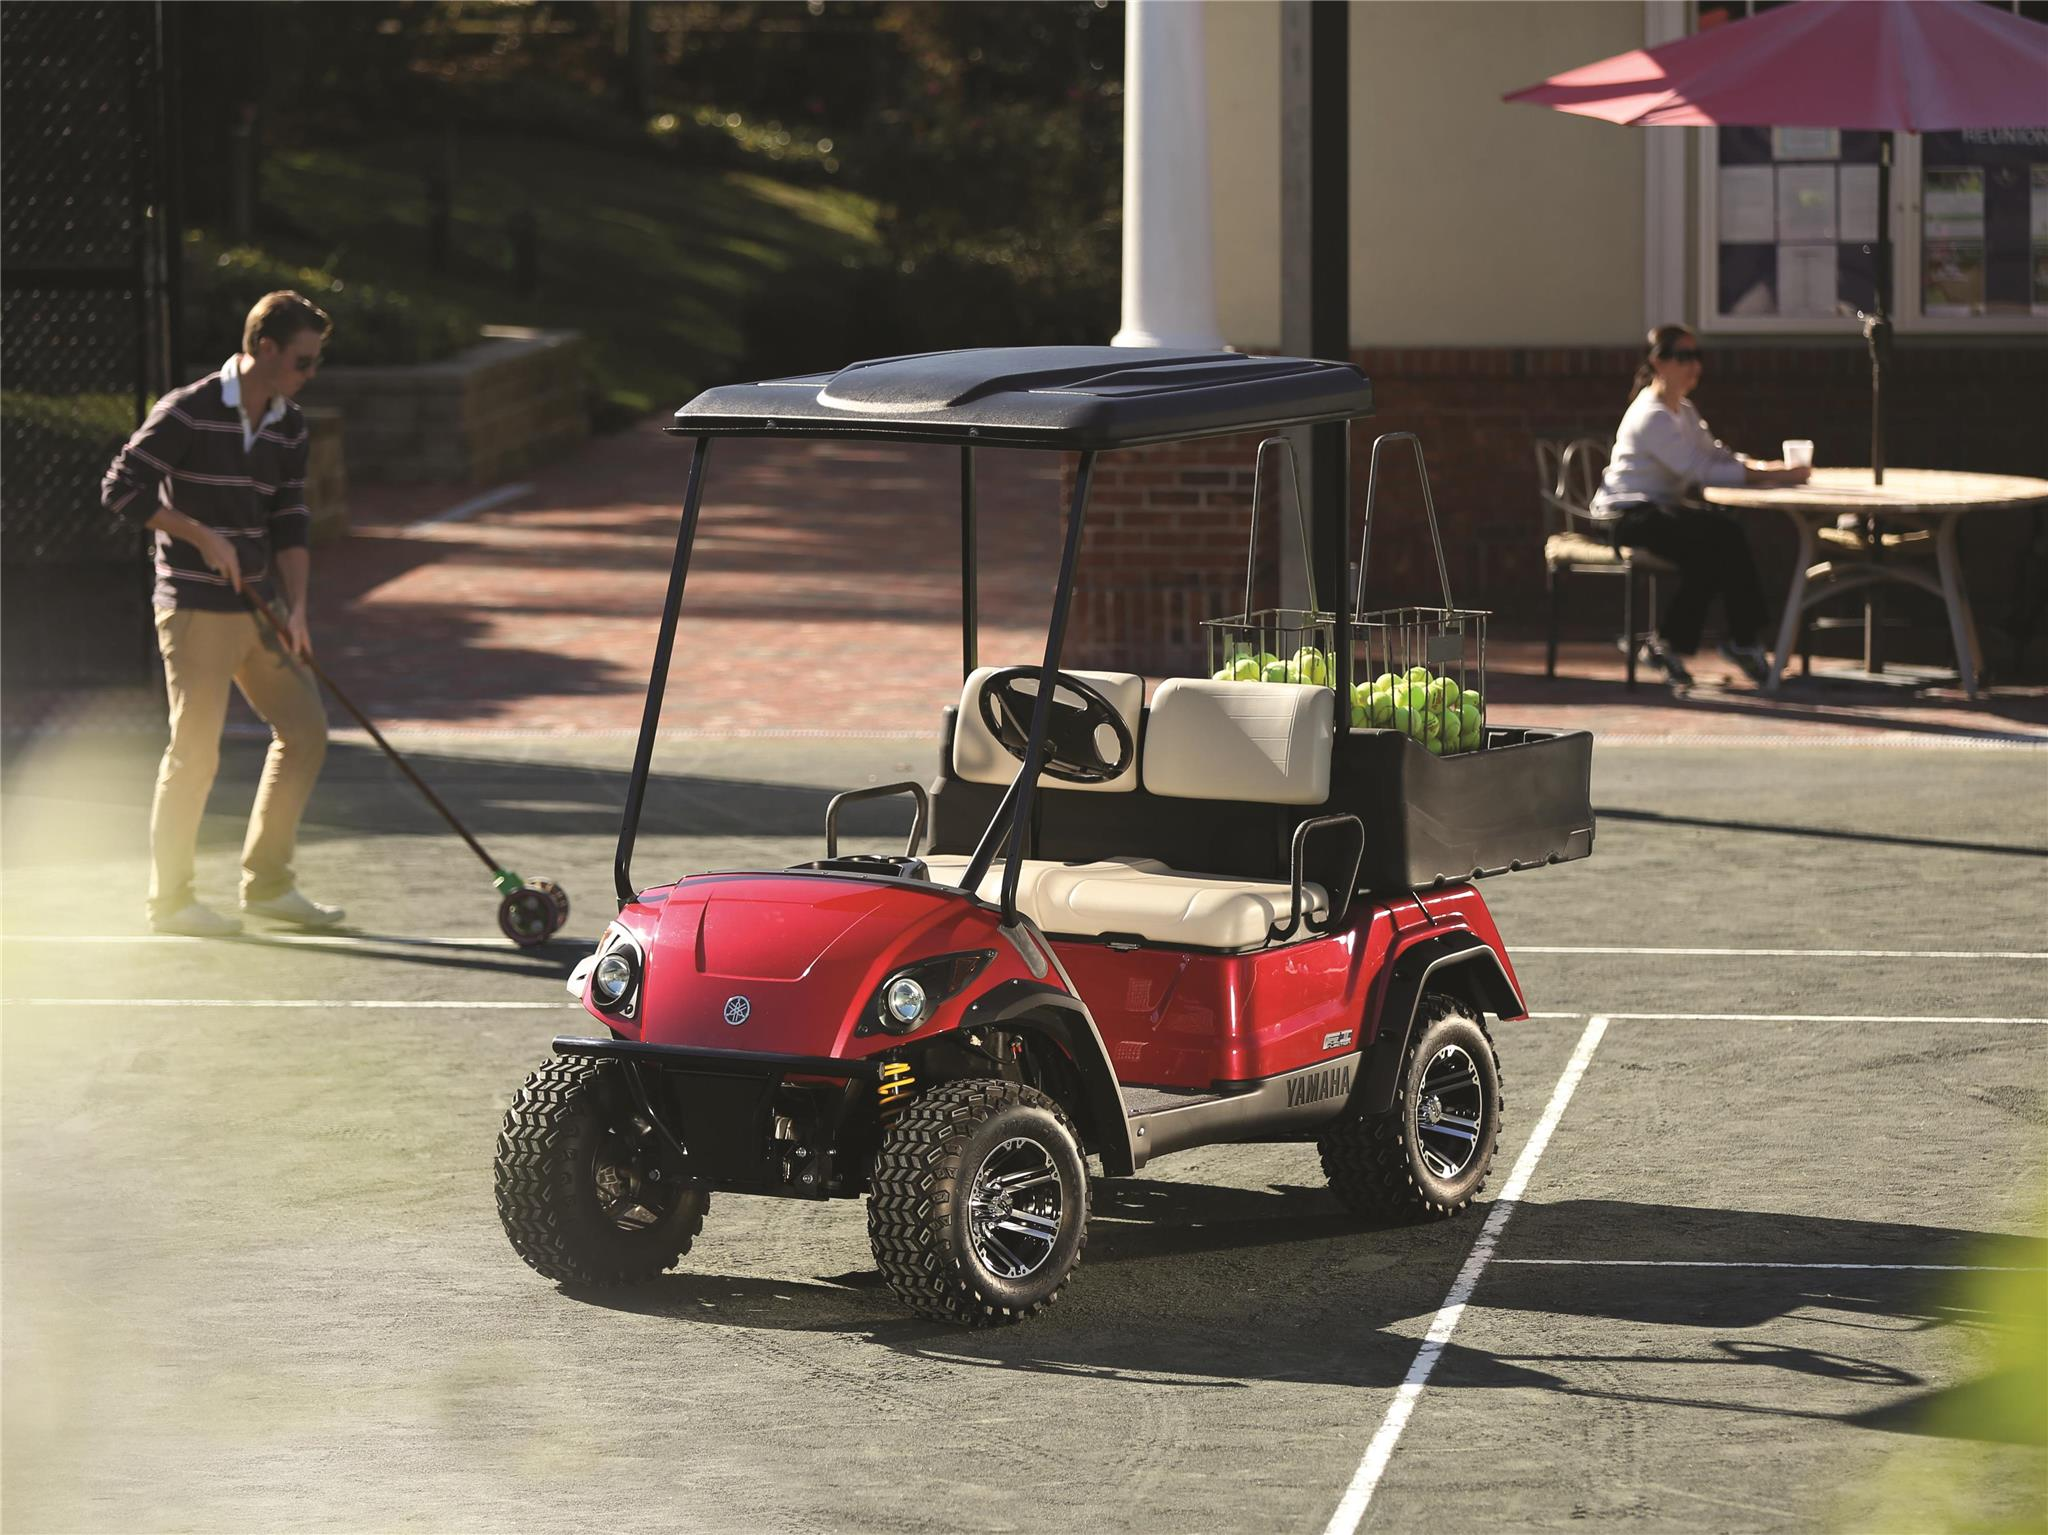 Used Cars Jesup Ga | Upcomingcarshq.com